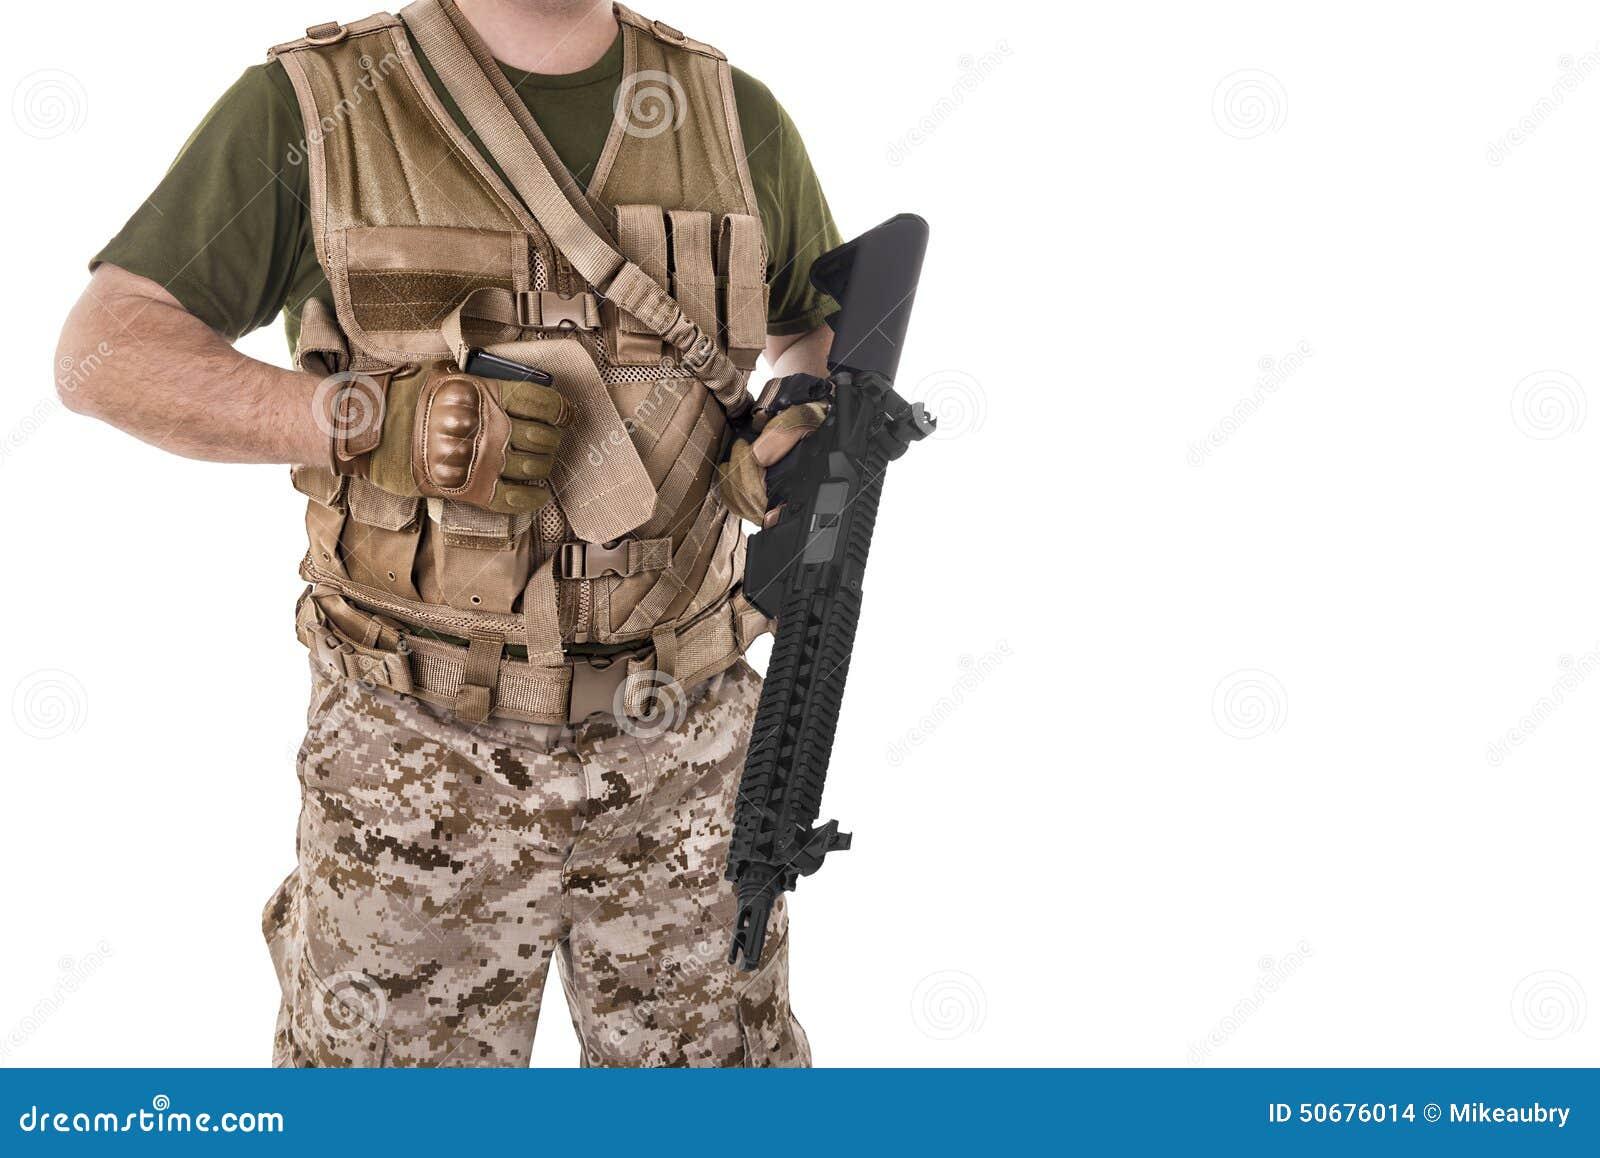 Download 拿着他的枪的战士人 库存照片. 图片 包括有 次幂, 手表, 战士, 步兵, 无法认出, 军事, 背心, 人员 - 50676014